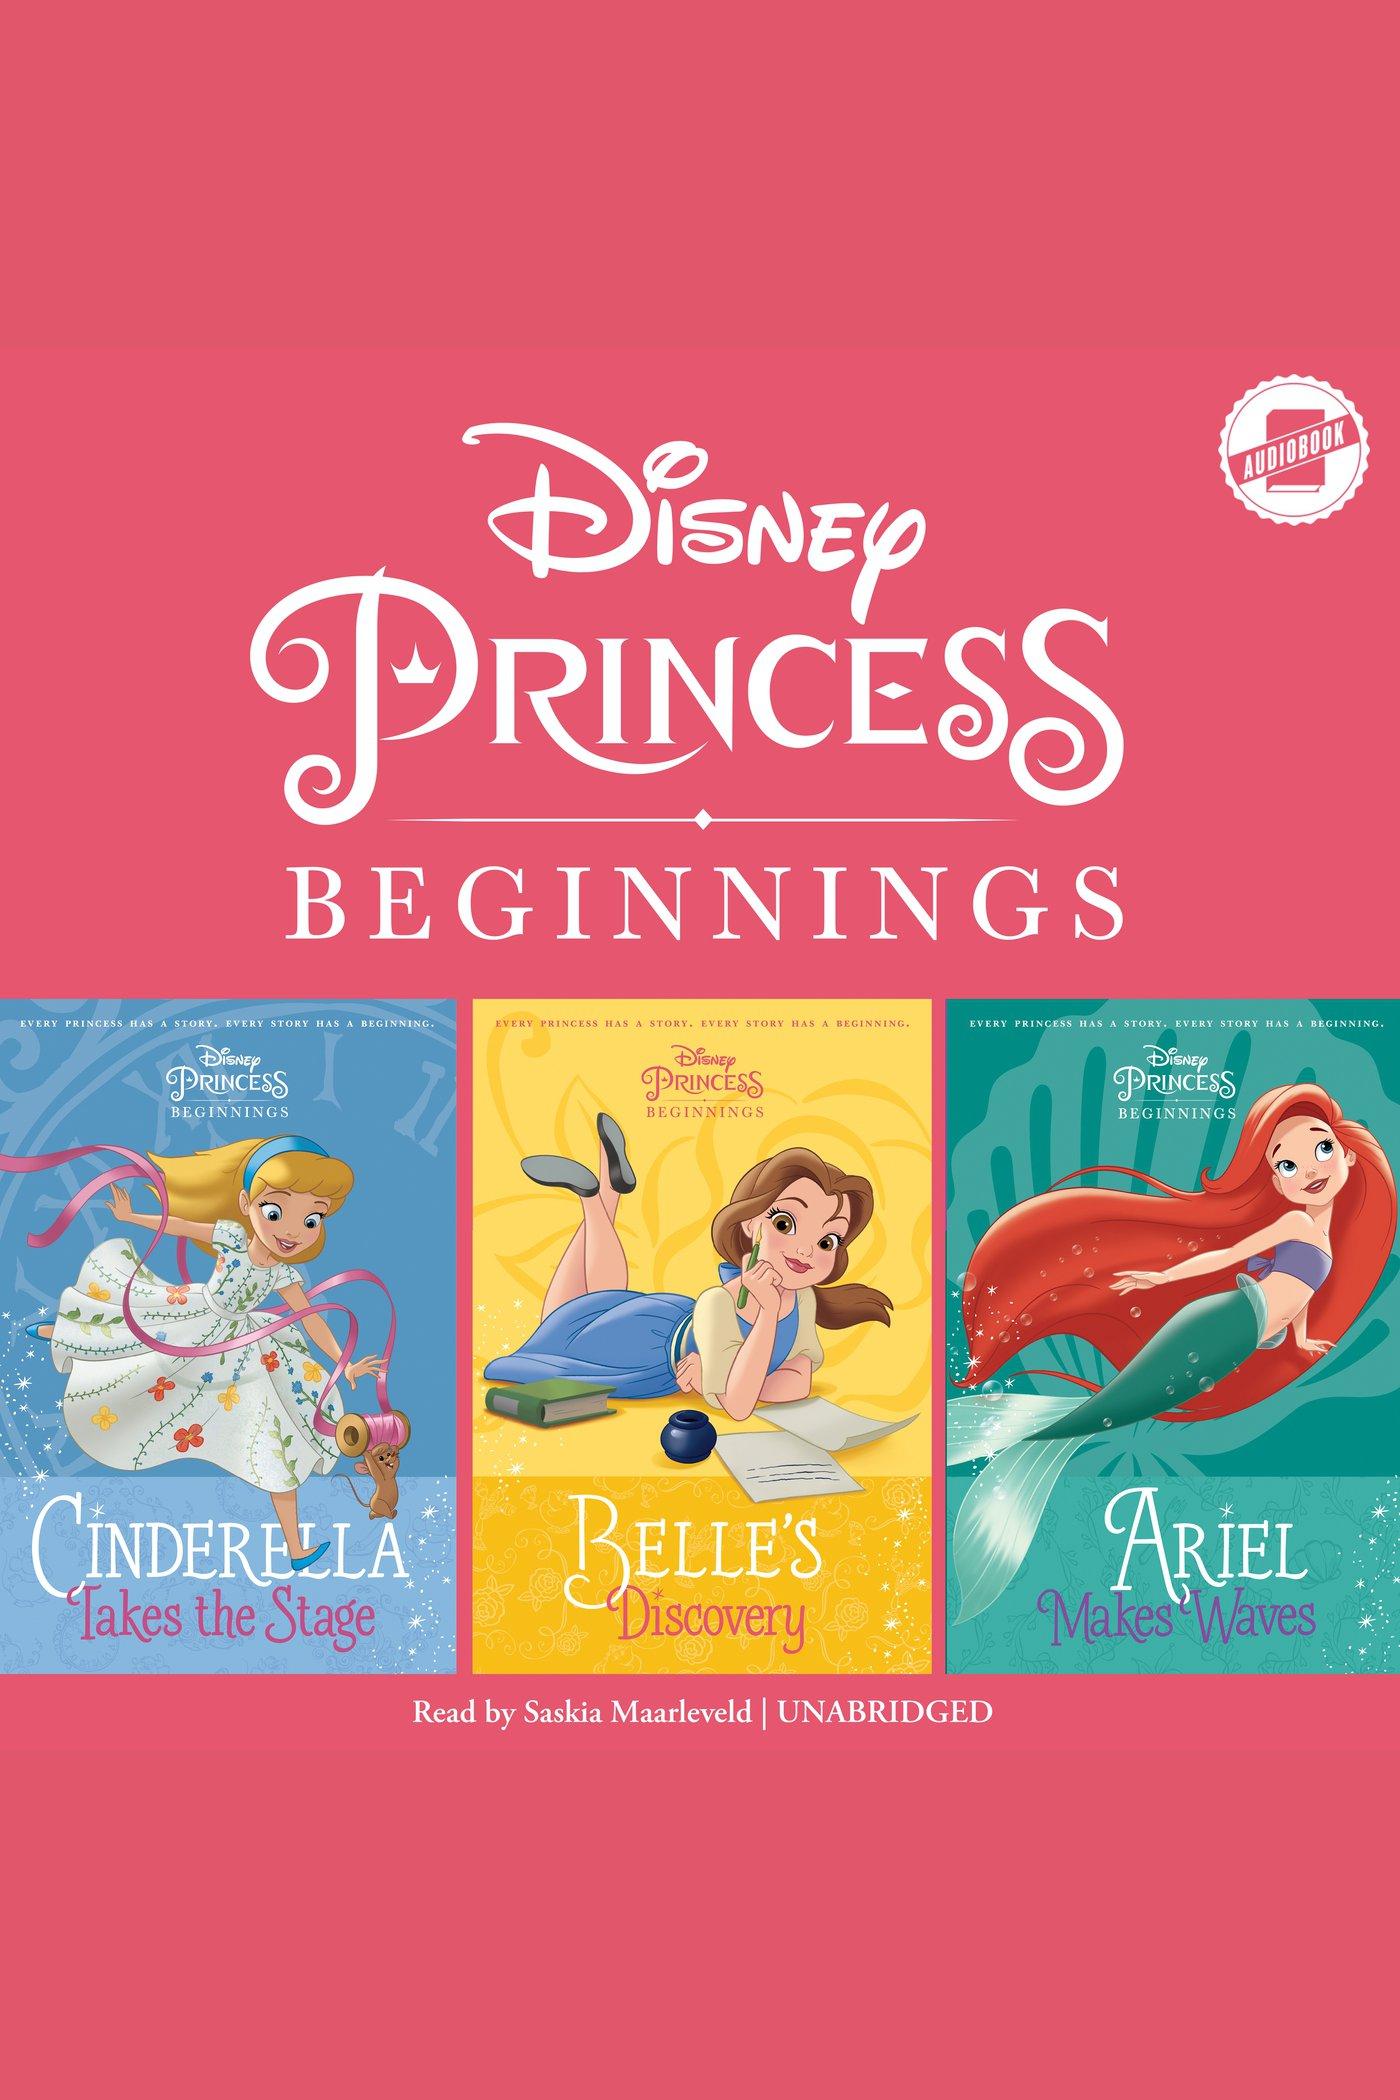 Disney Princess Beginnings: Cinderella, Belle & Ariel Cinderella Takes the Stage | Belle's Discovery | Ariel Makes Waves